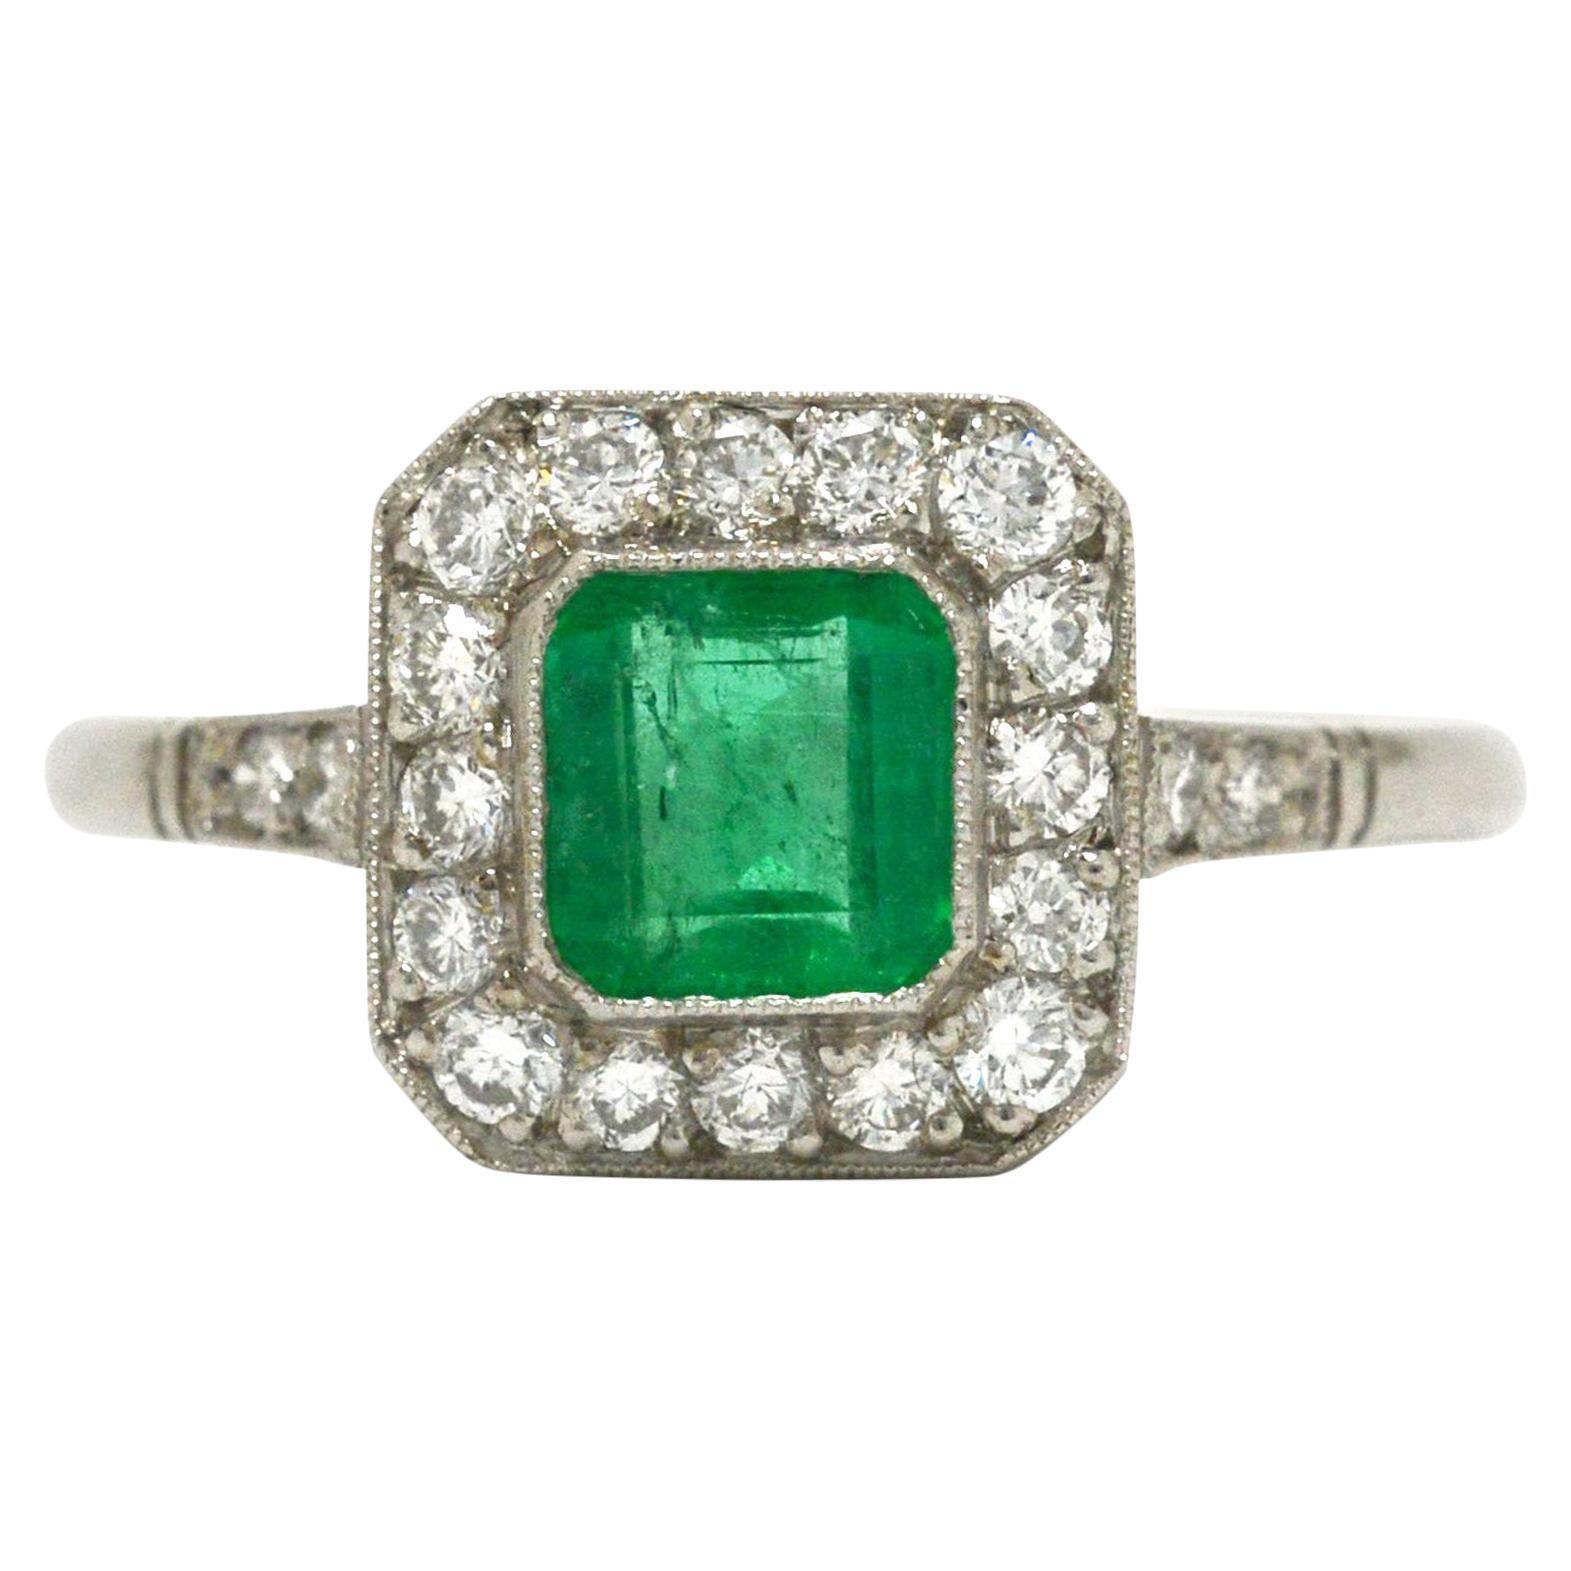 Art Deco Style Colombian Emerald Engagement Ring Square Diamond Halo Platinum